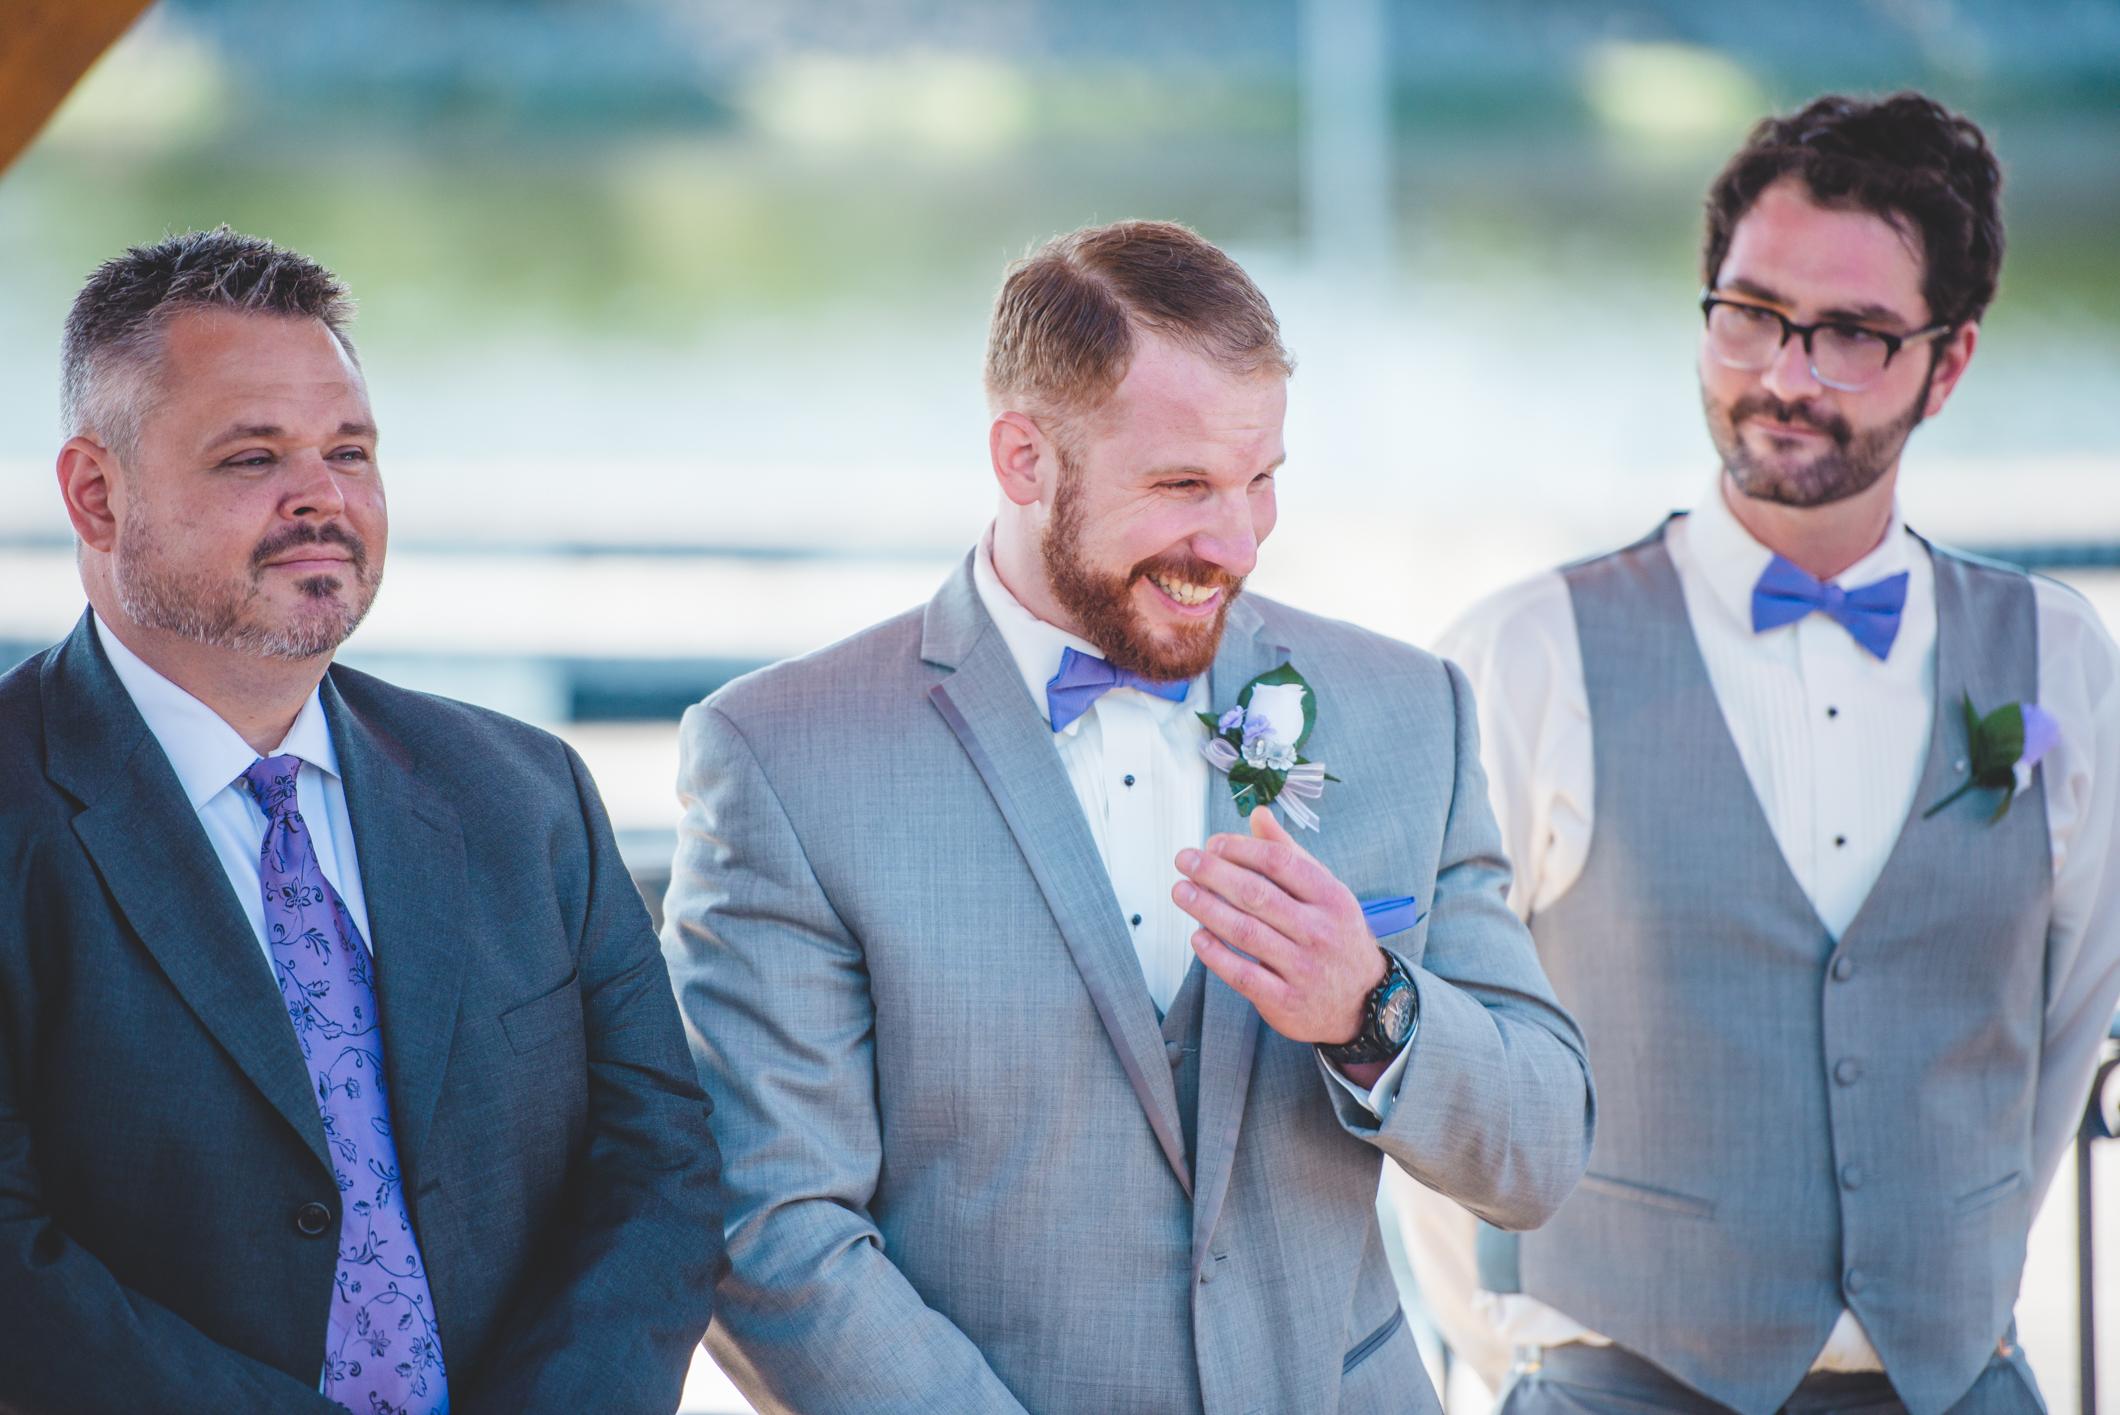 Casey & CJ Wedding - Preview - Creative Cure Weddings-7.jpg